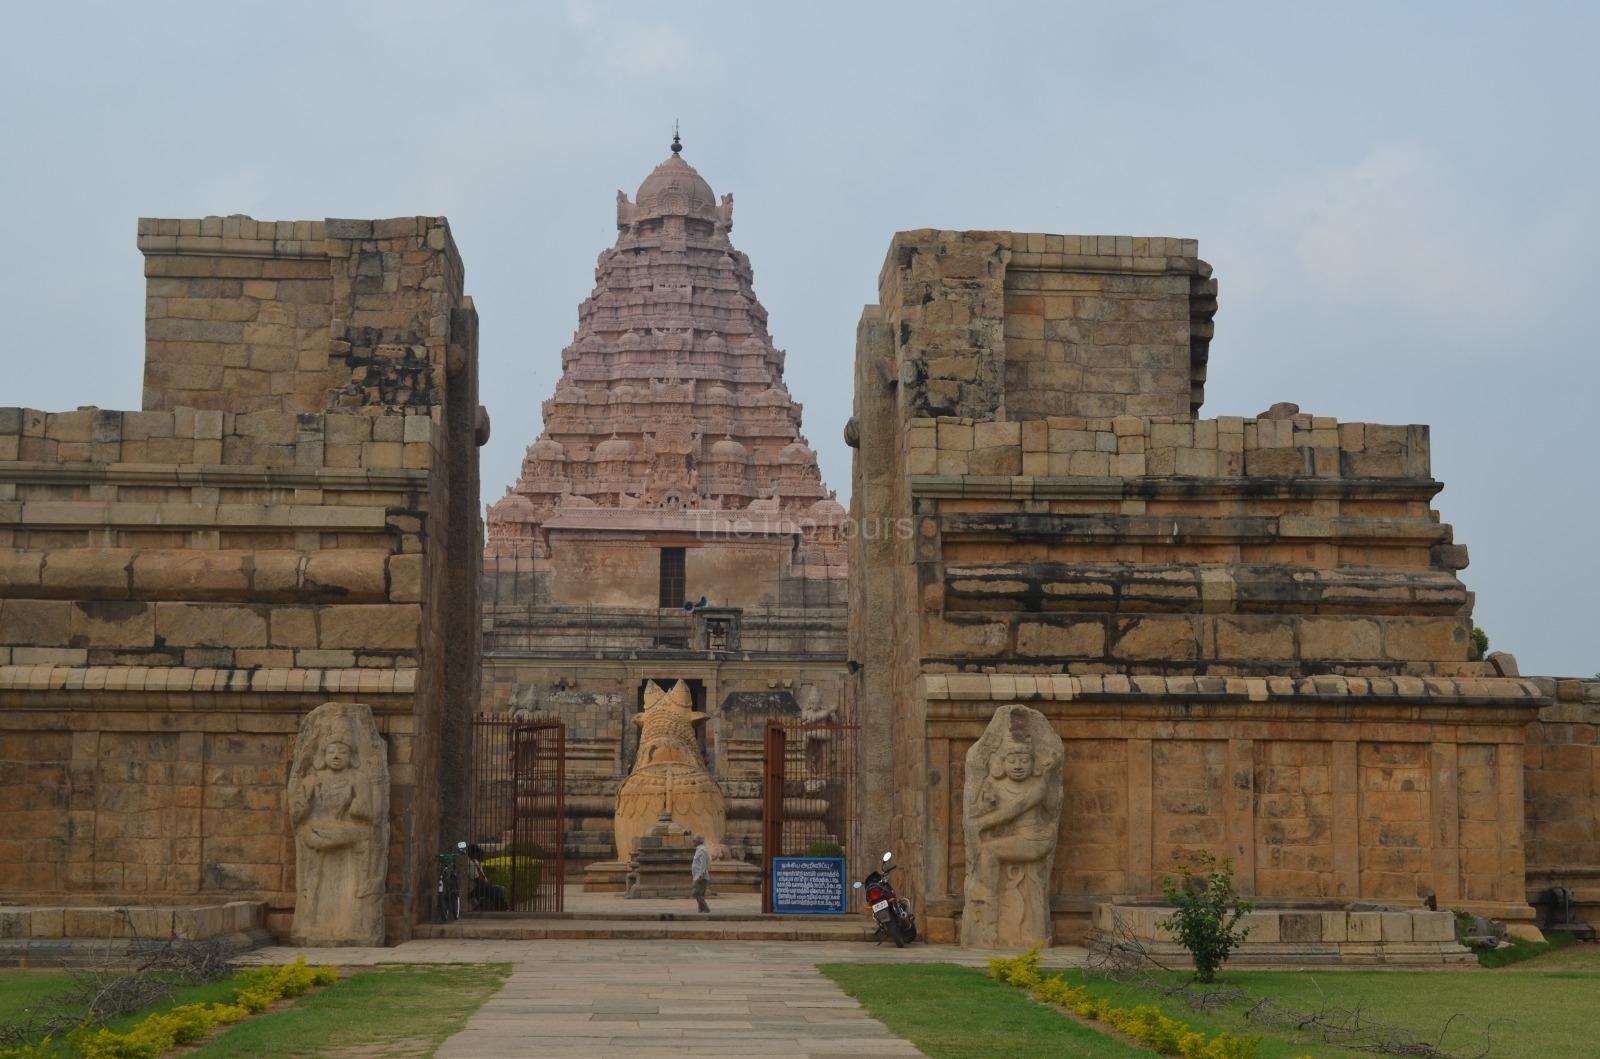 Brihadeeswara Temple Gangaikonda Cholapuram, In The South Indian State of Tamil Nadu